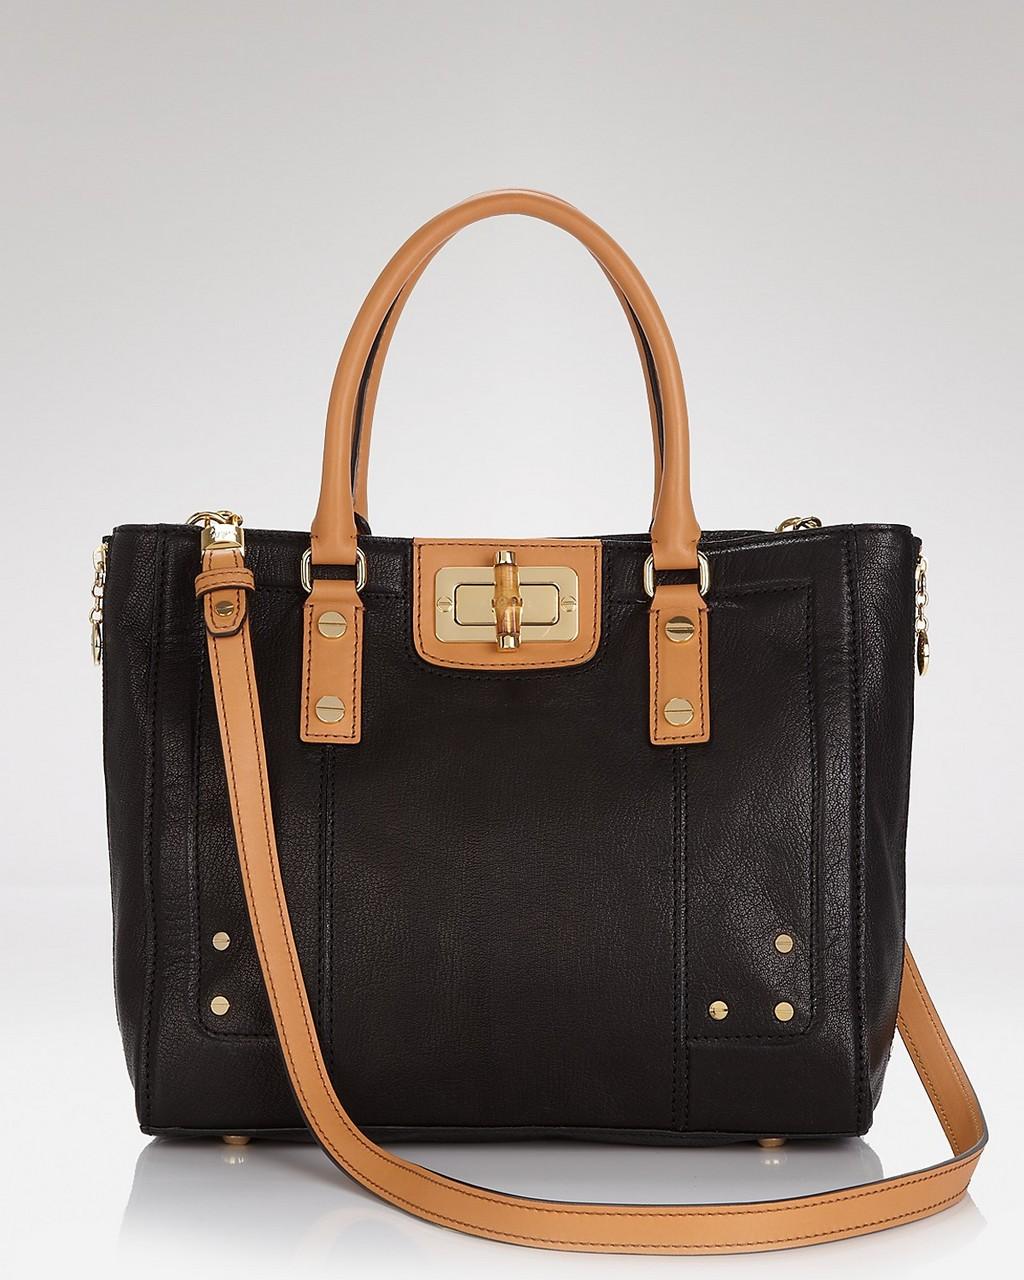 milly handbags perlina handbags kooba handbags mcm handbags